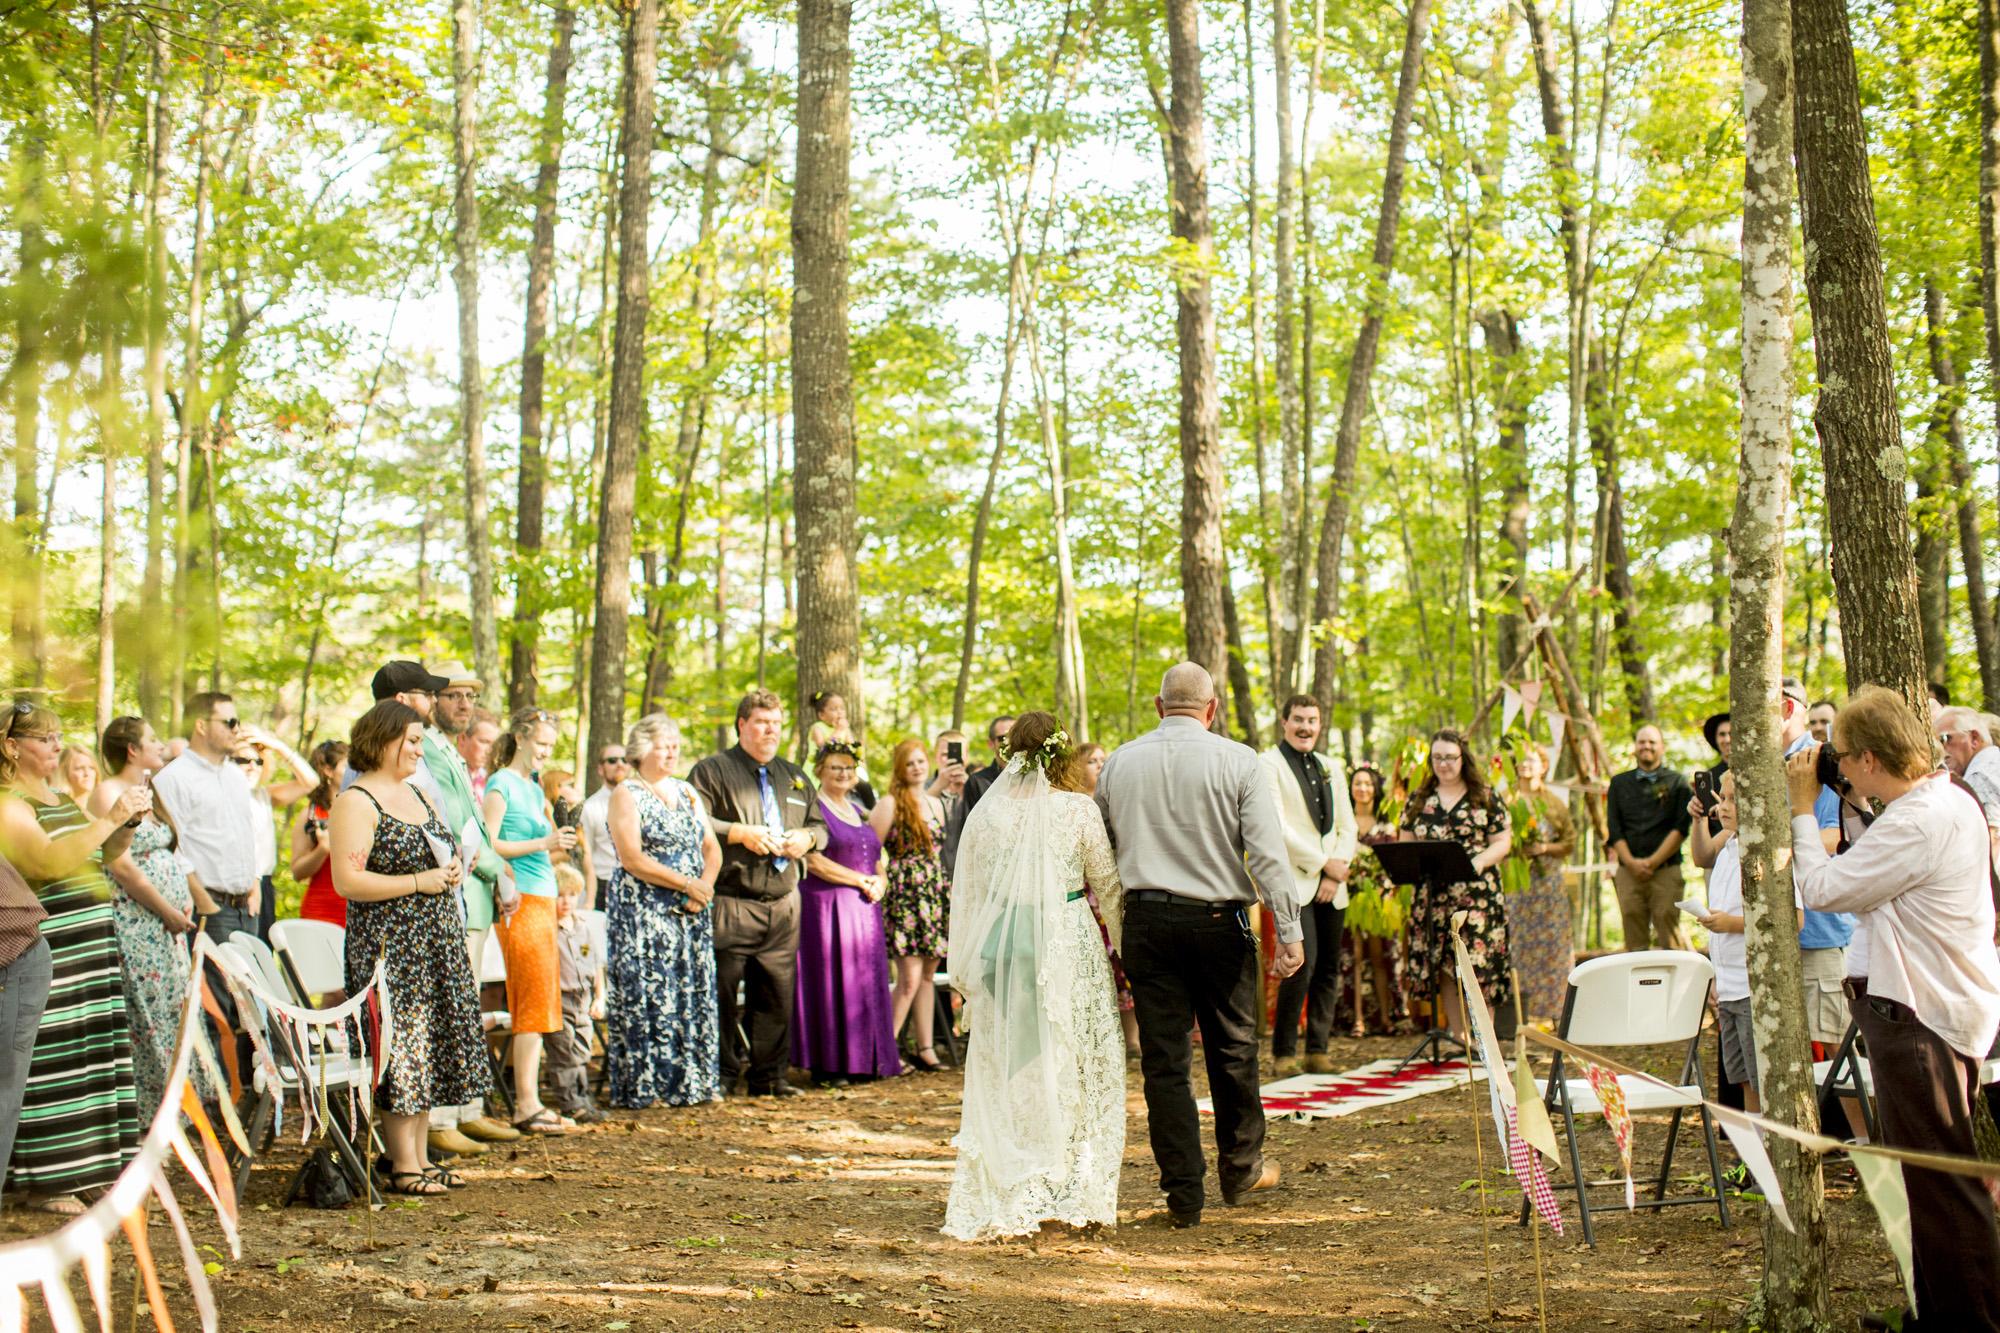 Seriously_Sabrina_Photography_Red_River_Gorge_Kentucky_Wedding_ShawnDana113.jpg